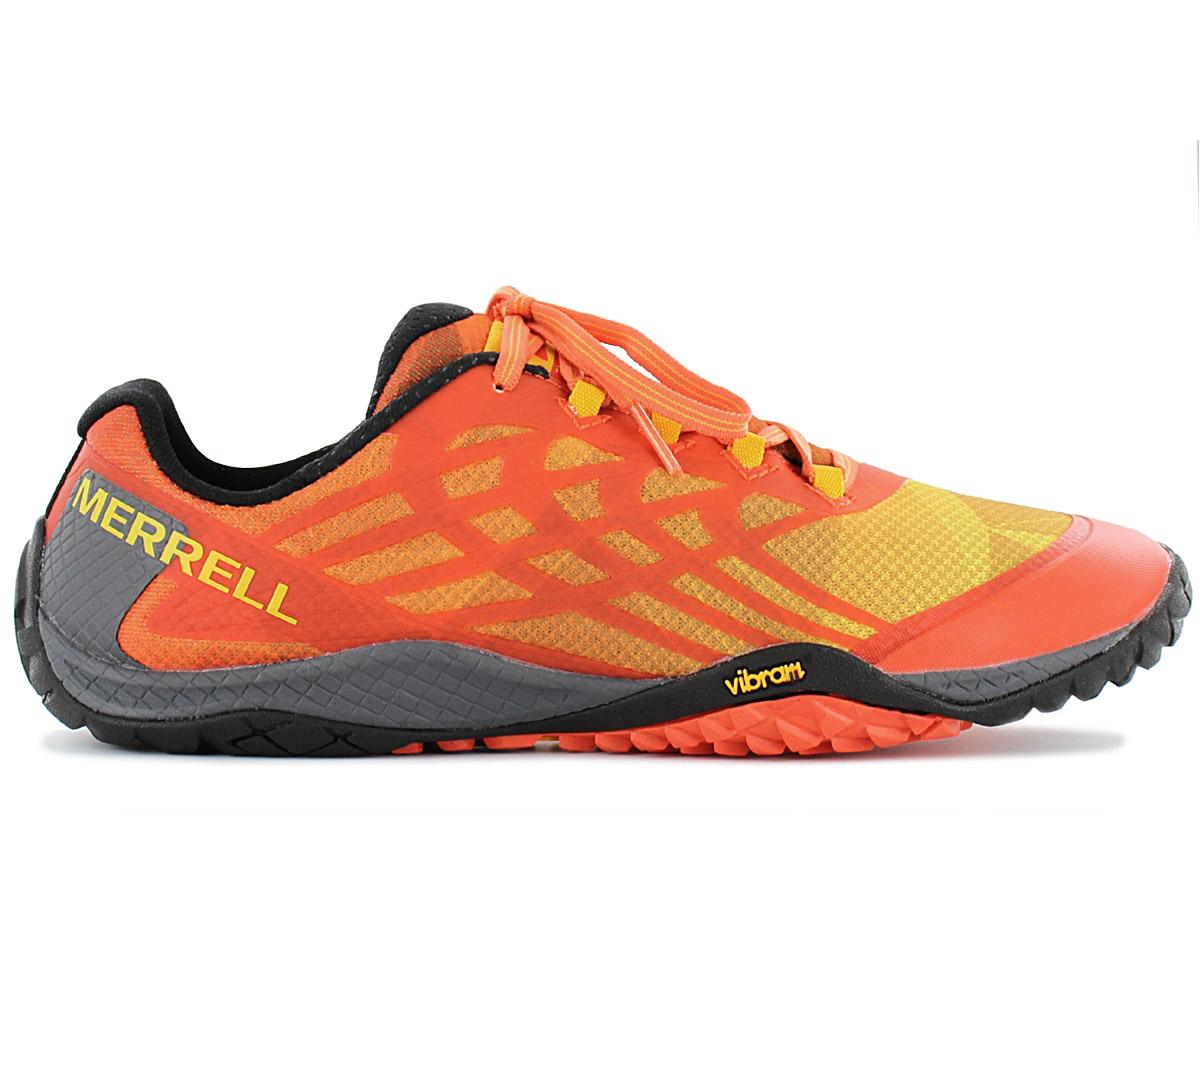 55c1438df1 Details about Merrell Trail Glove 4 Men Outdoor Barefoot Shoes J17023  Barefoot Shoes Orange